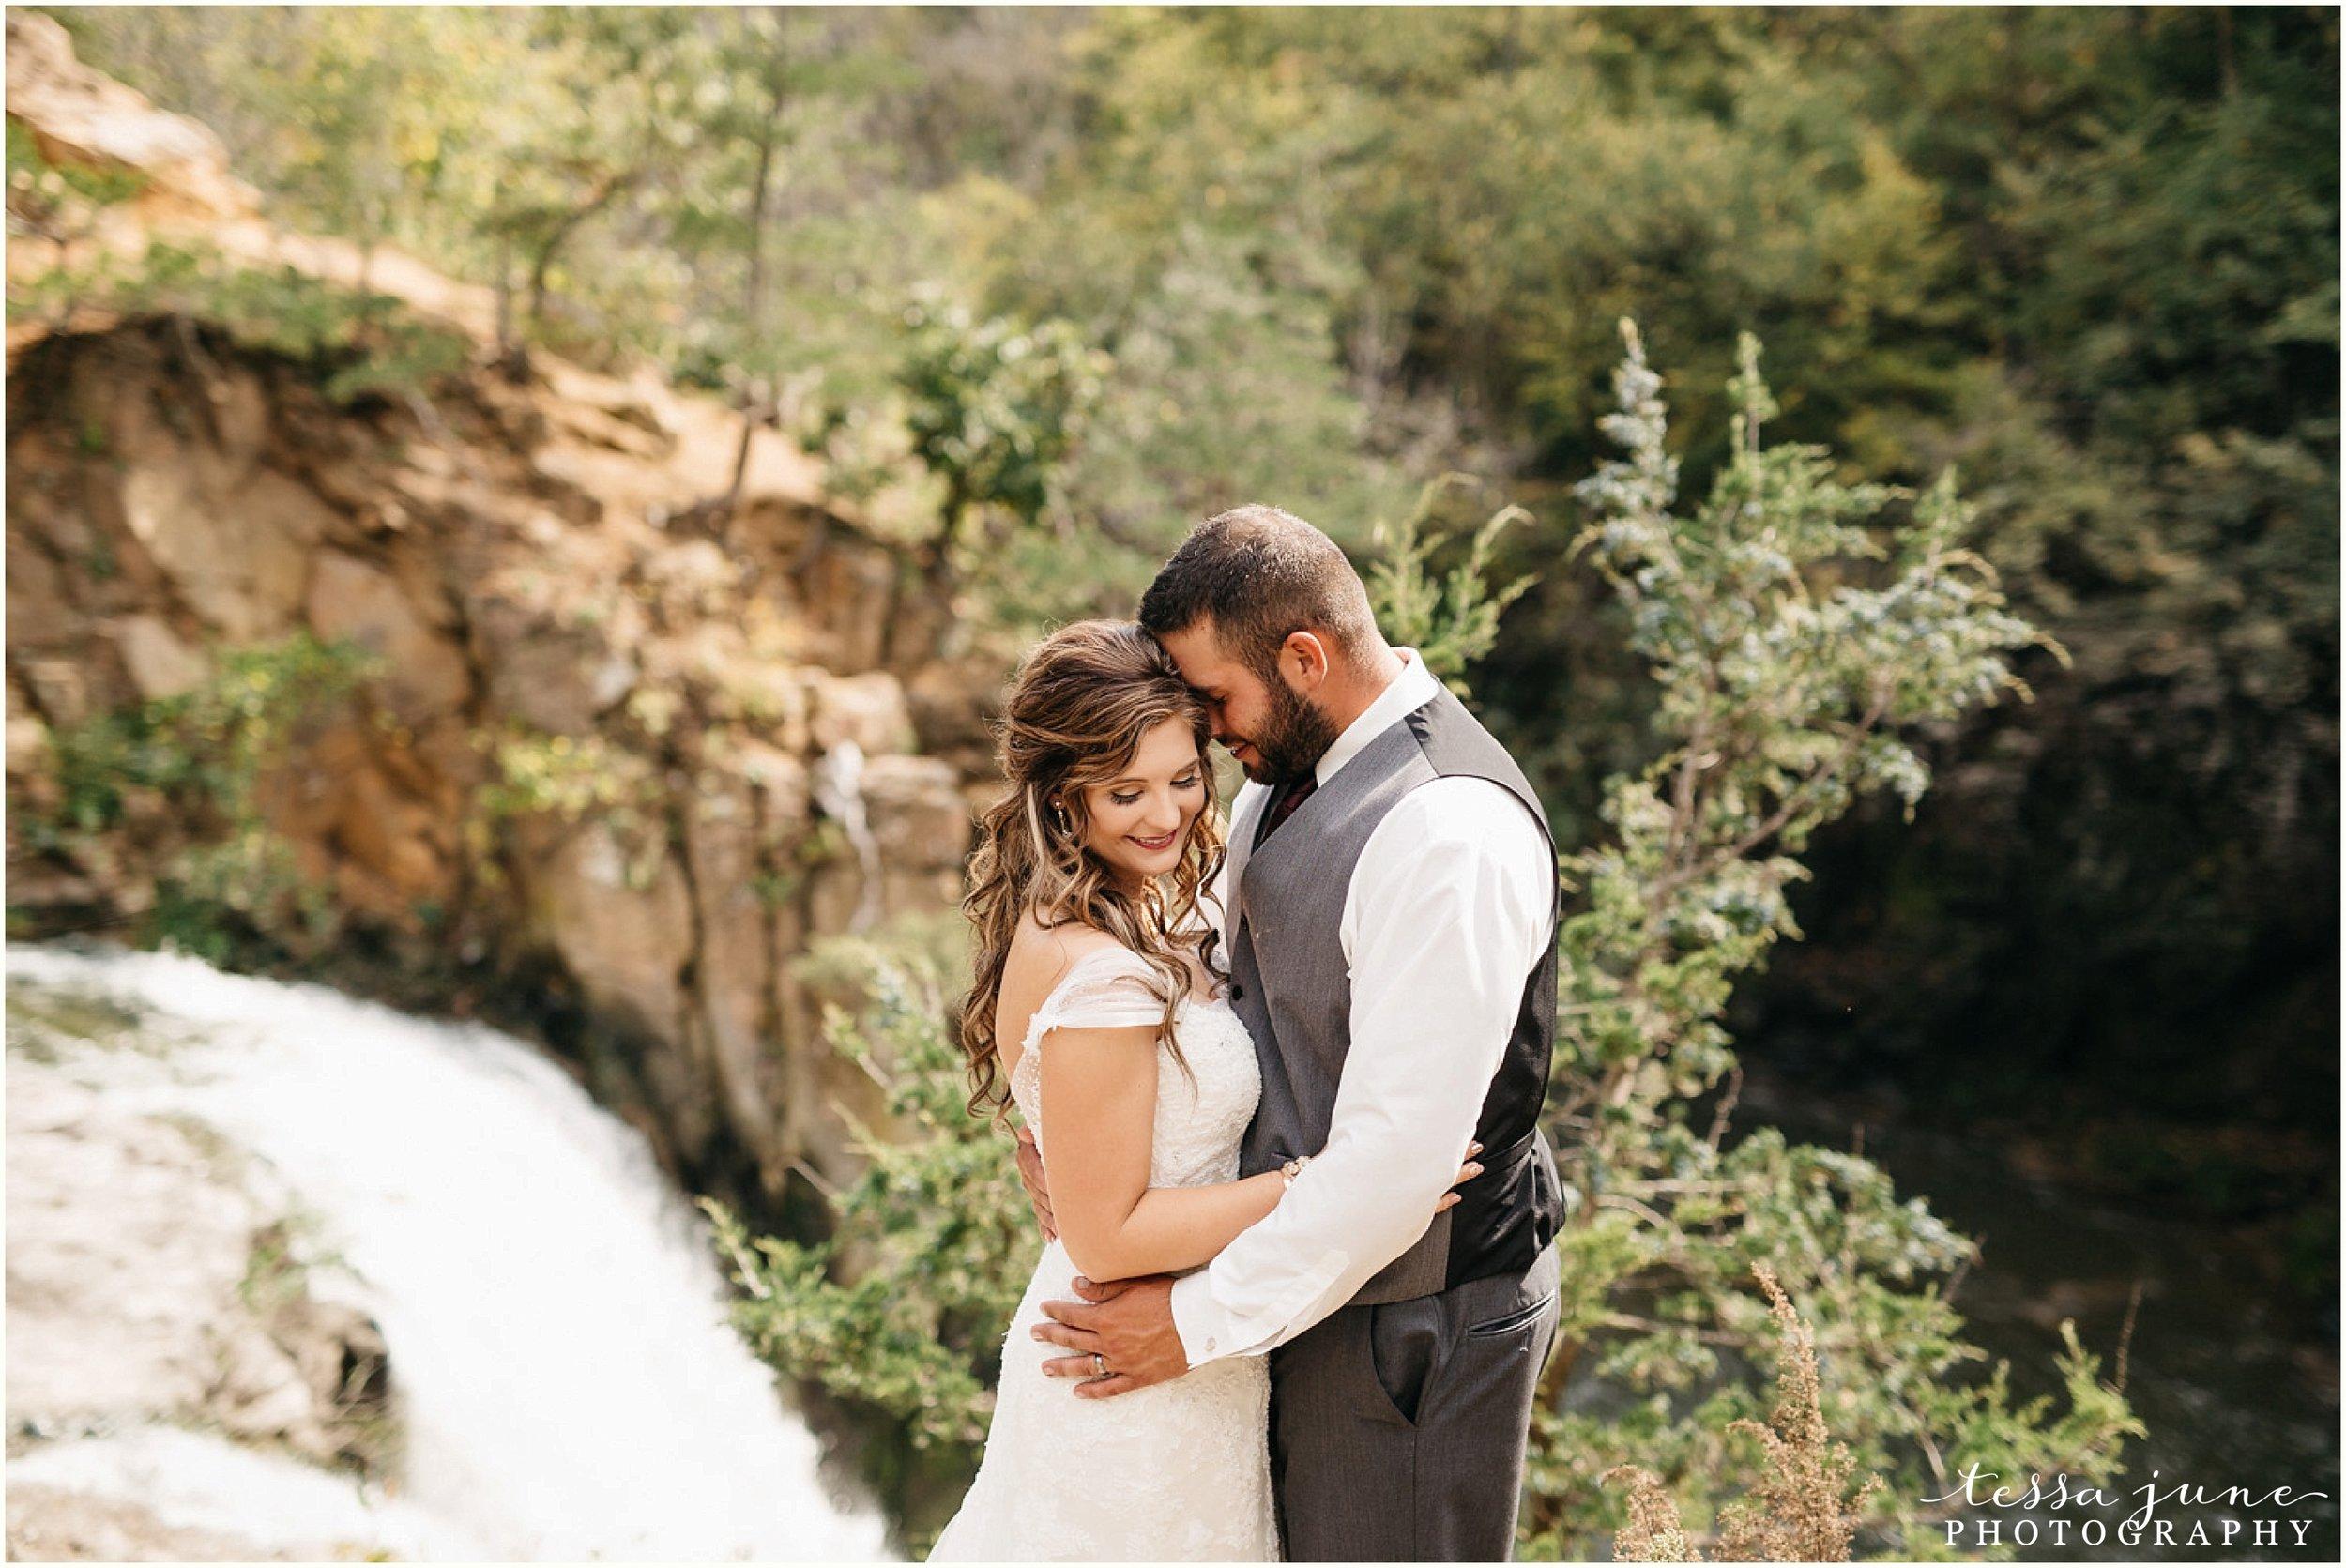 bohemian-minnesota-wedding-mismatched-bridesmaid-dresses-waterfall-st-cloud-tessa-june-photography-55.jpg